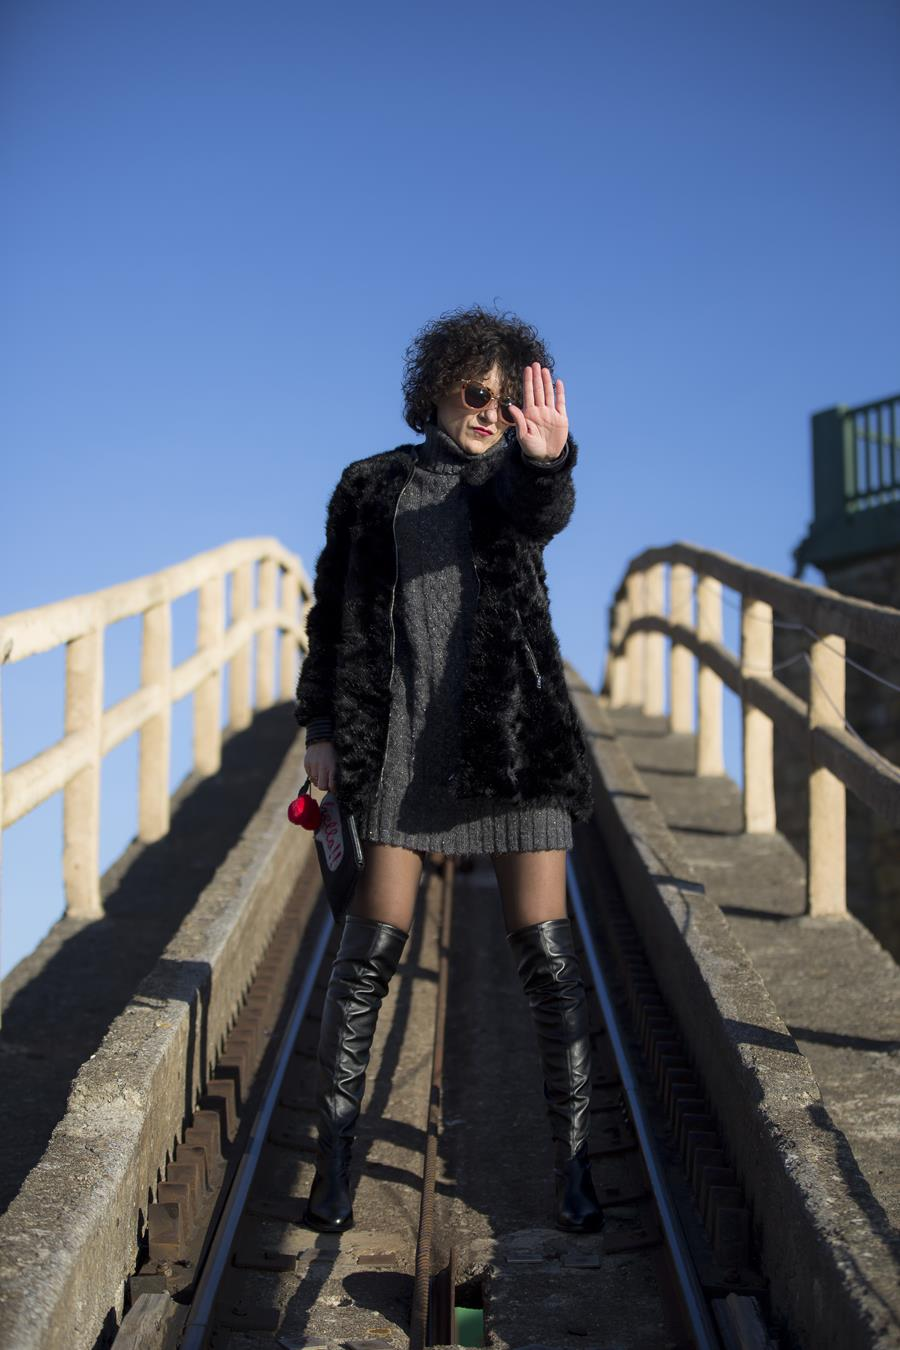 Rebeca Valdivia, personal shopper, Miss Clov, Donostia, San Sebastián, Igueldo, boots otk, botas por encima de la rodilla, wool dress, vestido de lana, abrigo piel sintética, faux fur coat, bolso mano, hand bag, curls, curlygirl, curlspower, rizos